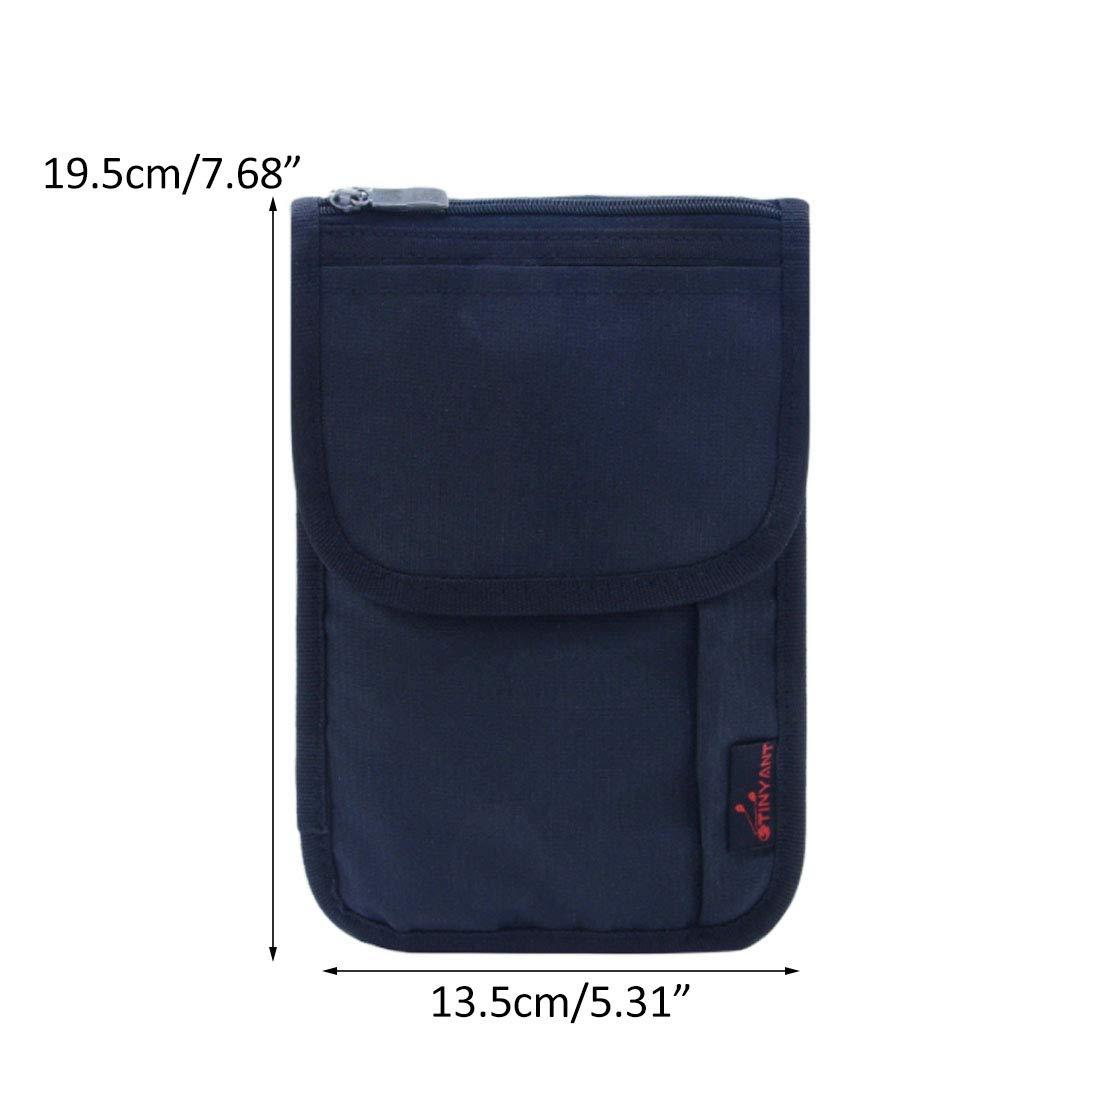 Bverionant Passport Organizer Shoulder Strap with Zipper Document Bag Holder Wallet for Travel Pink